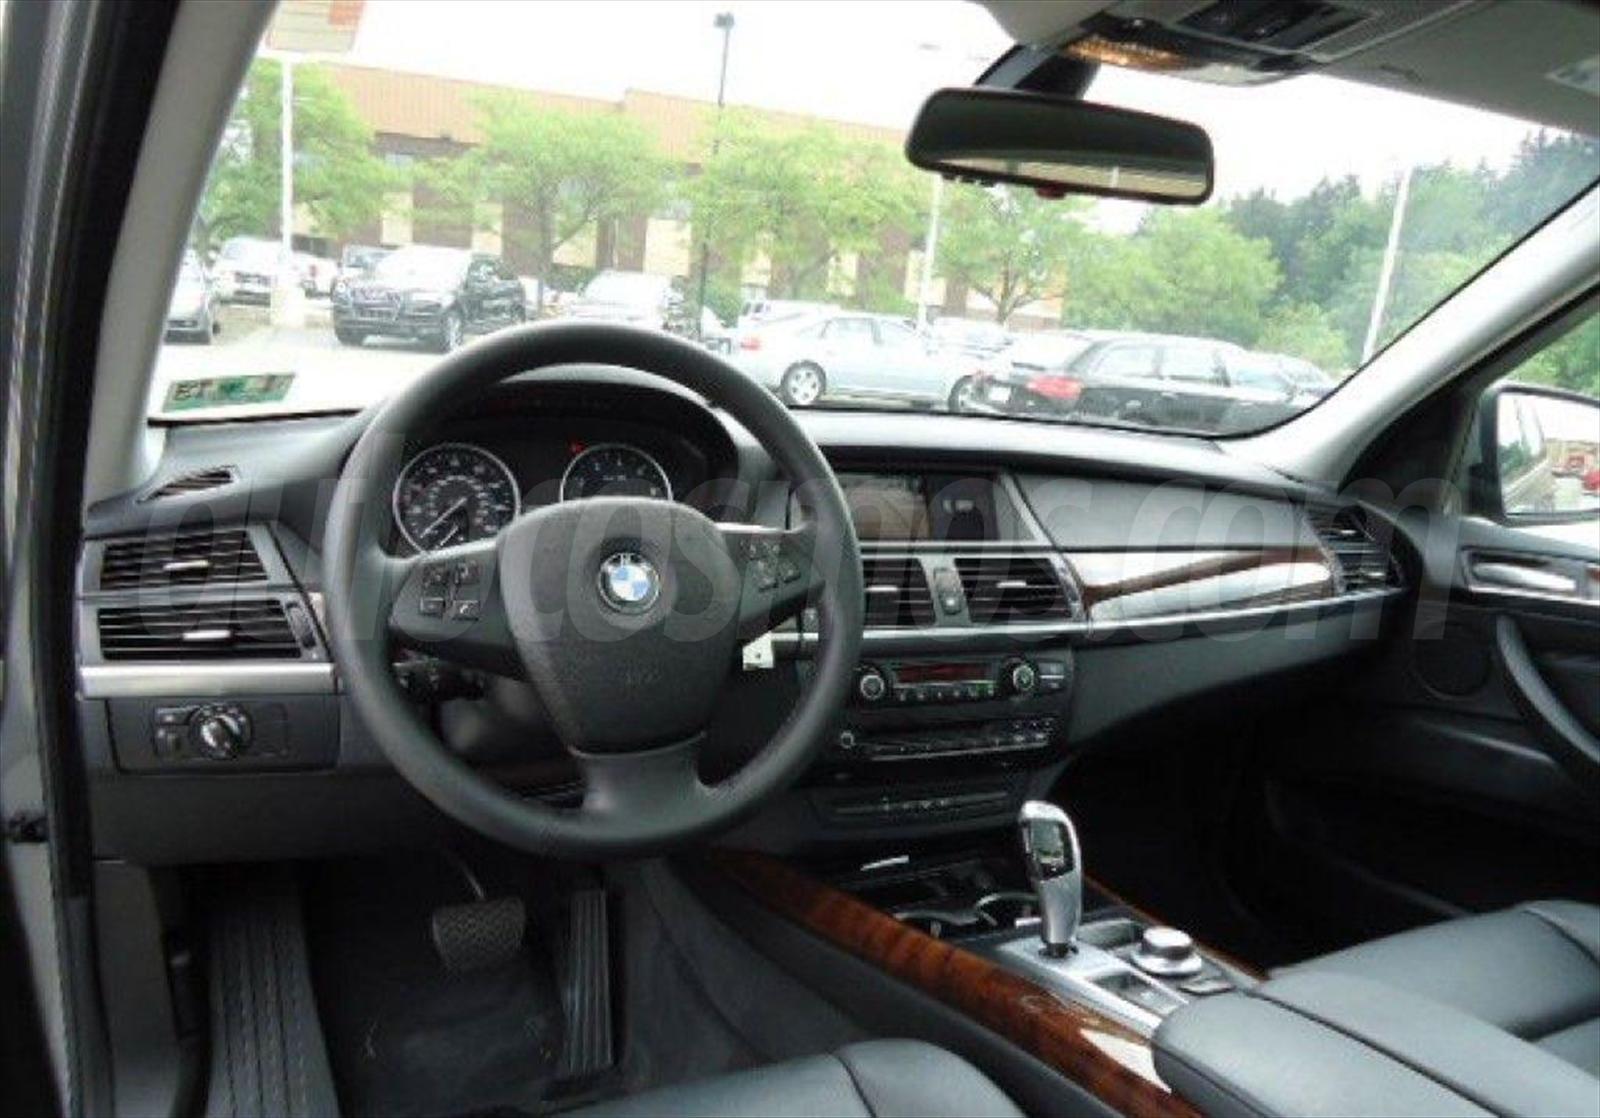 Venta carros usado - Distrito Capital - BMW Serie X5